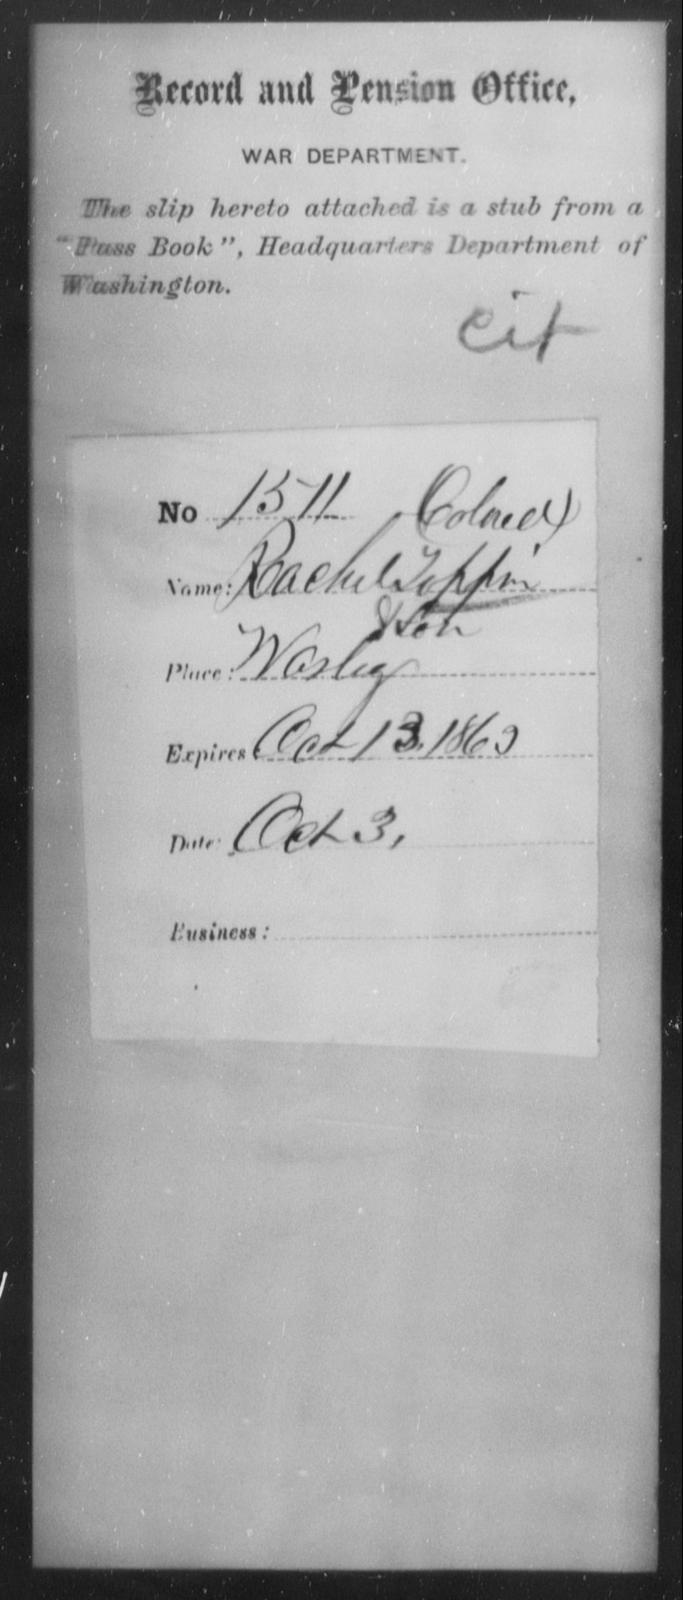 Toppan, Rachel - State: Washington - Year: 1863